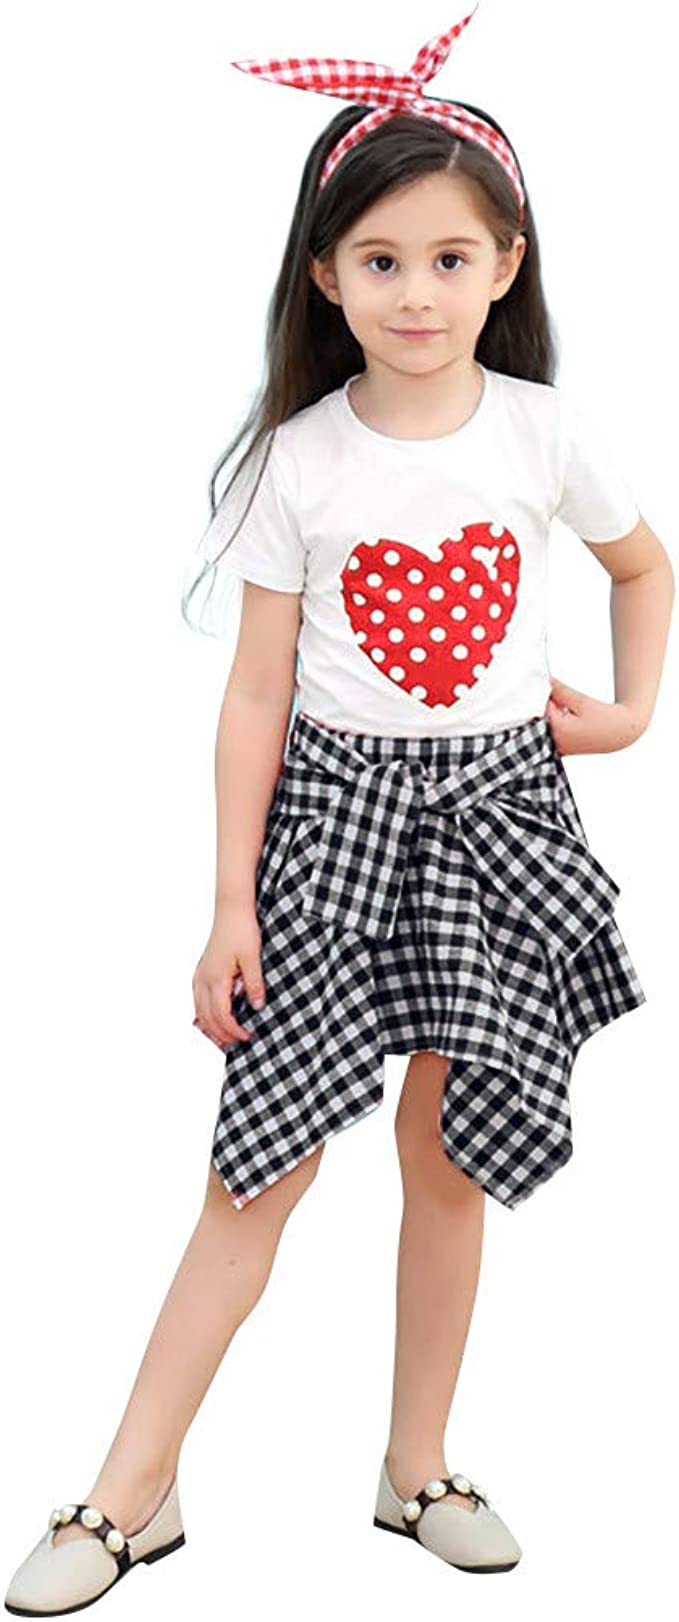 2pc Kids Baby Girls Long Sleeve Shirt Tops+Long Pants Skirt Dress Outfit Clothes